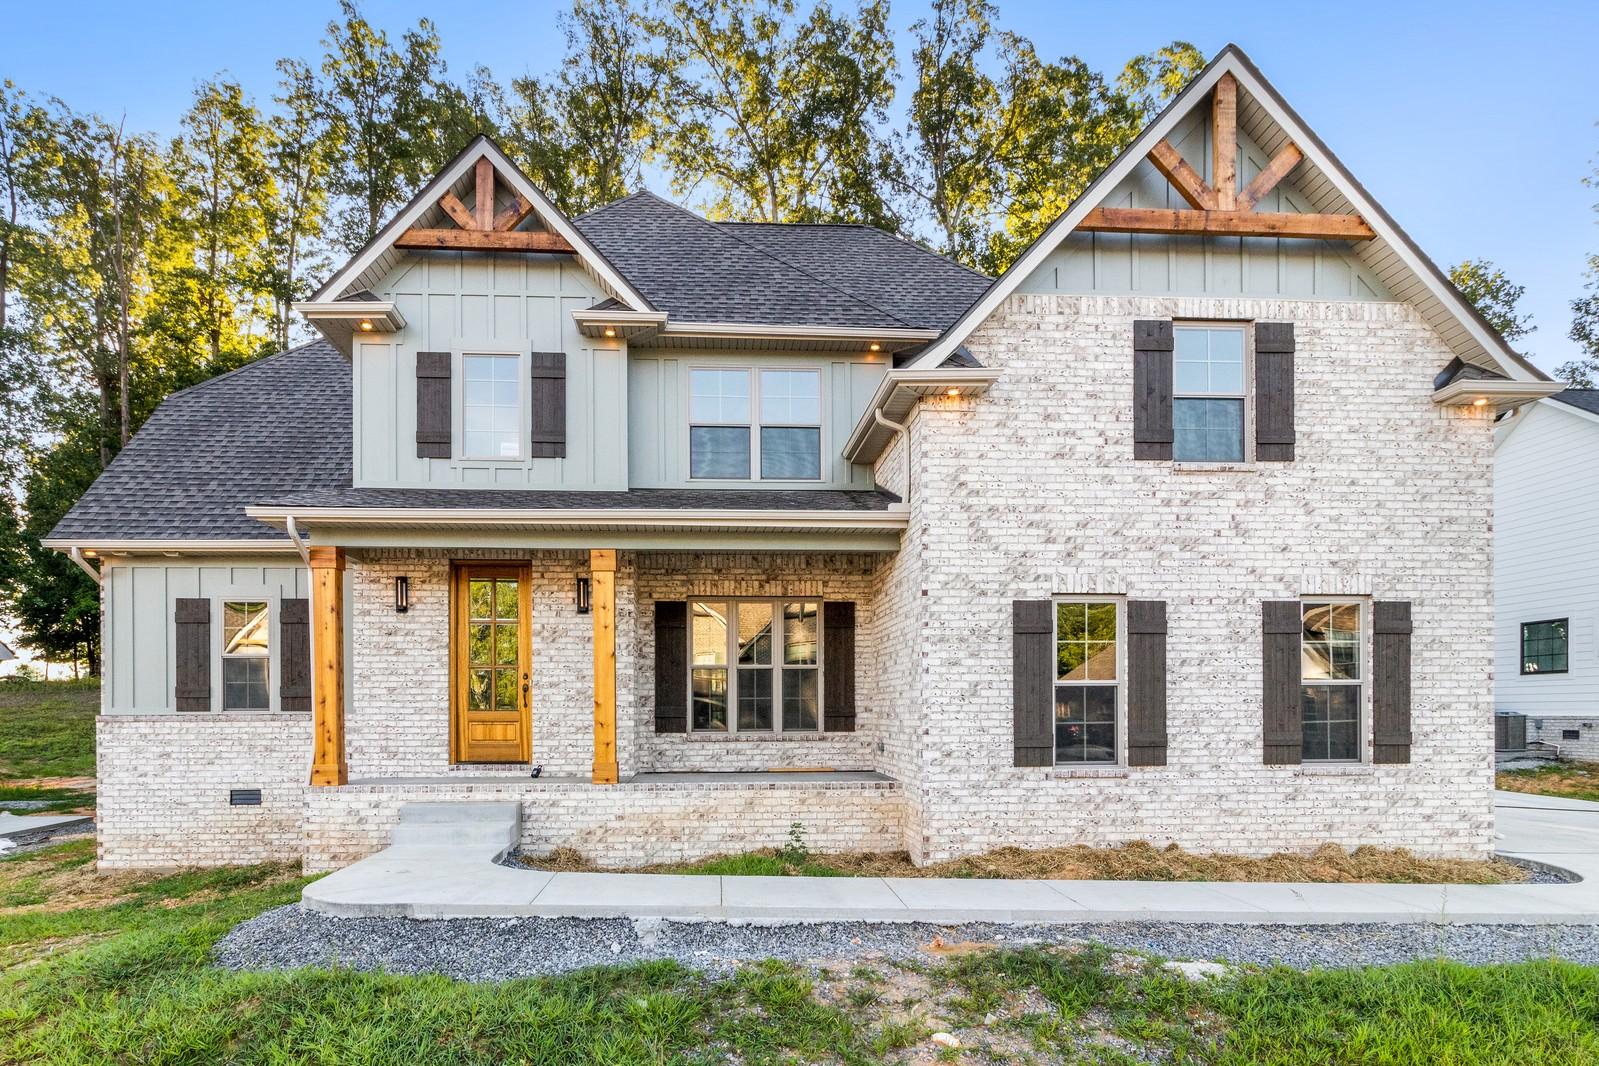 54 Whitewood Farm Property Photo